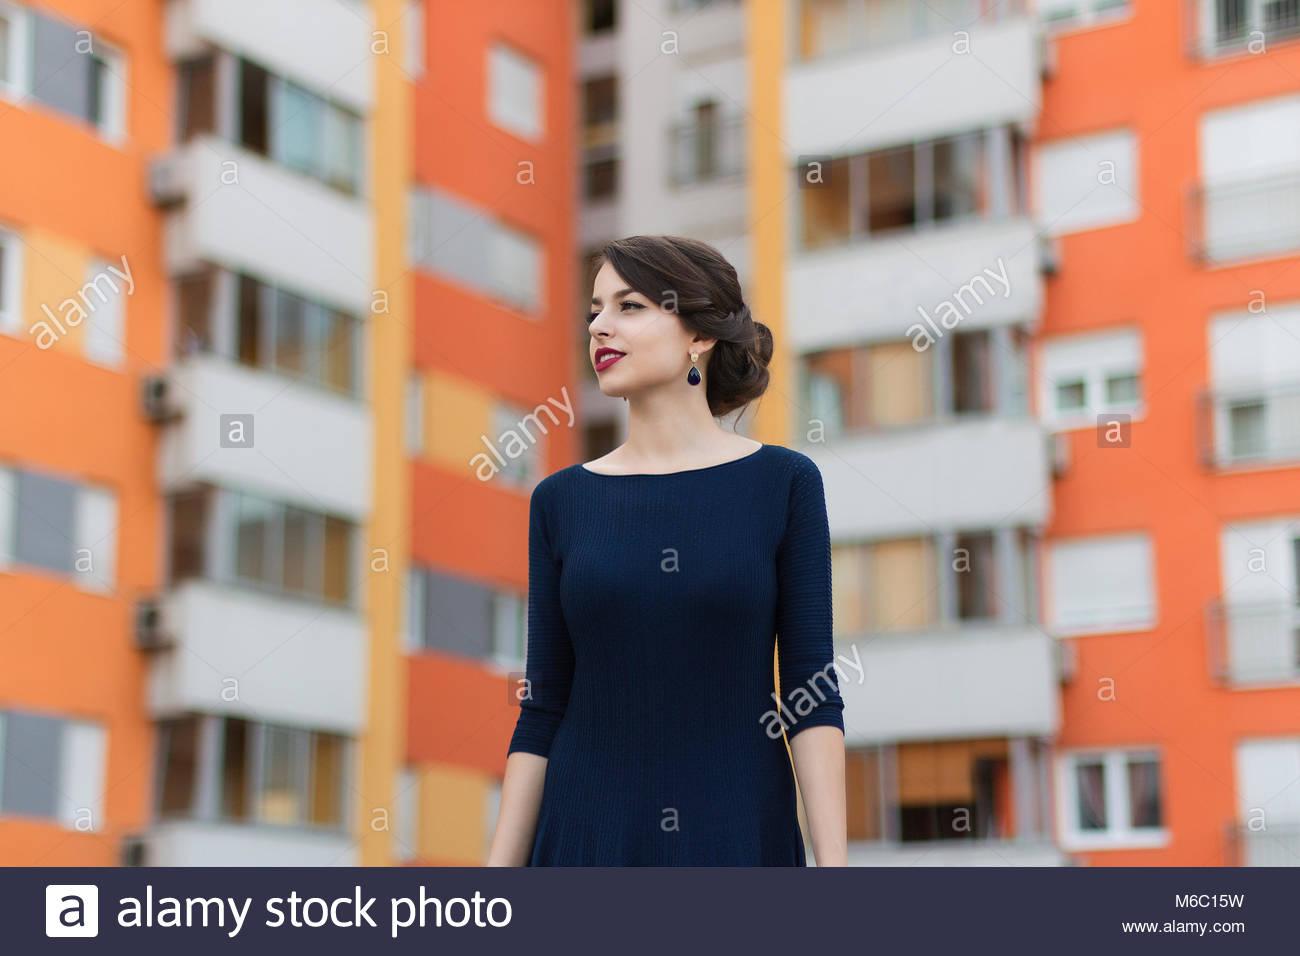 Prom Dress Stockfotos & Prom Dress Bilder - Alamy